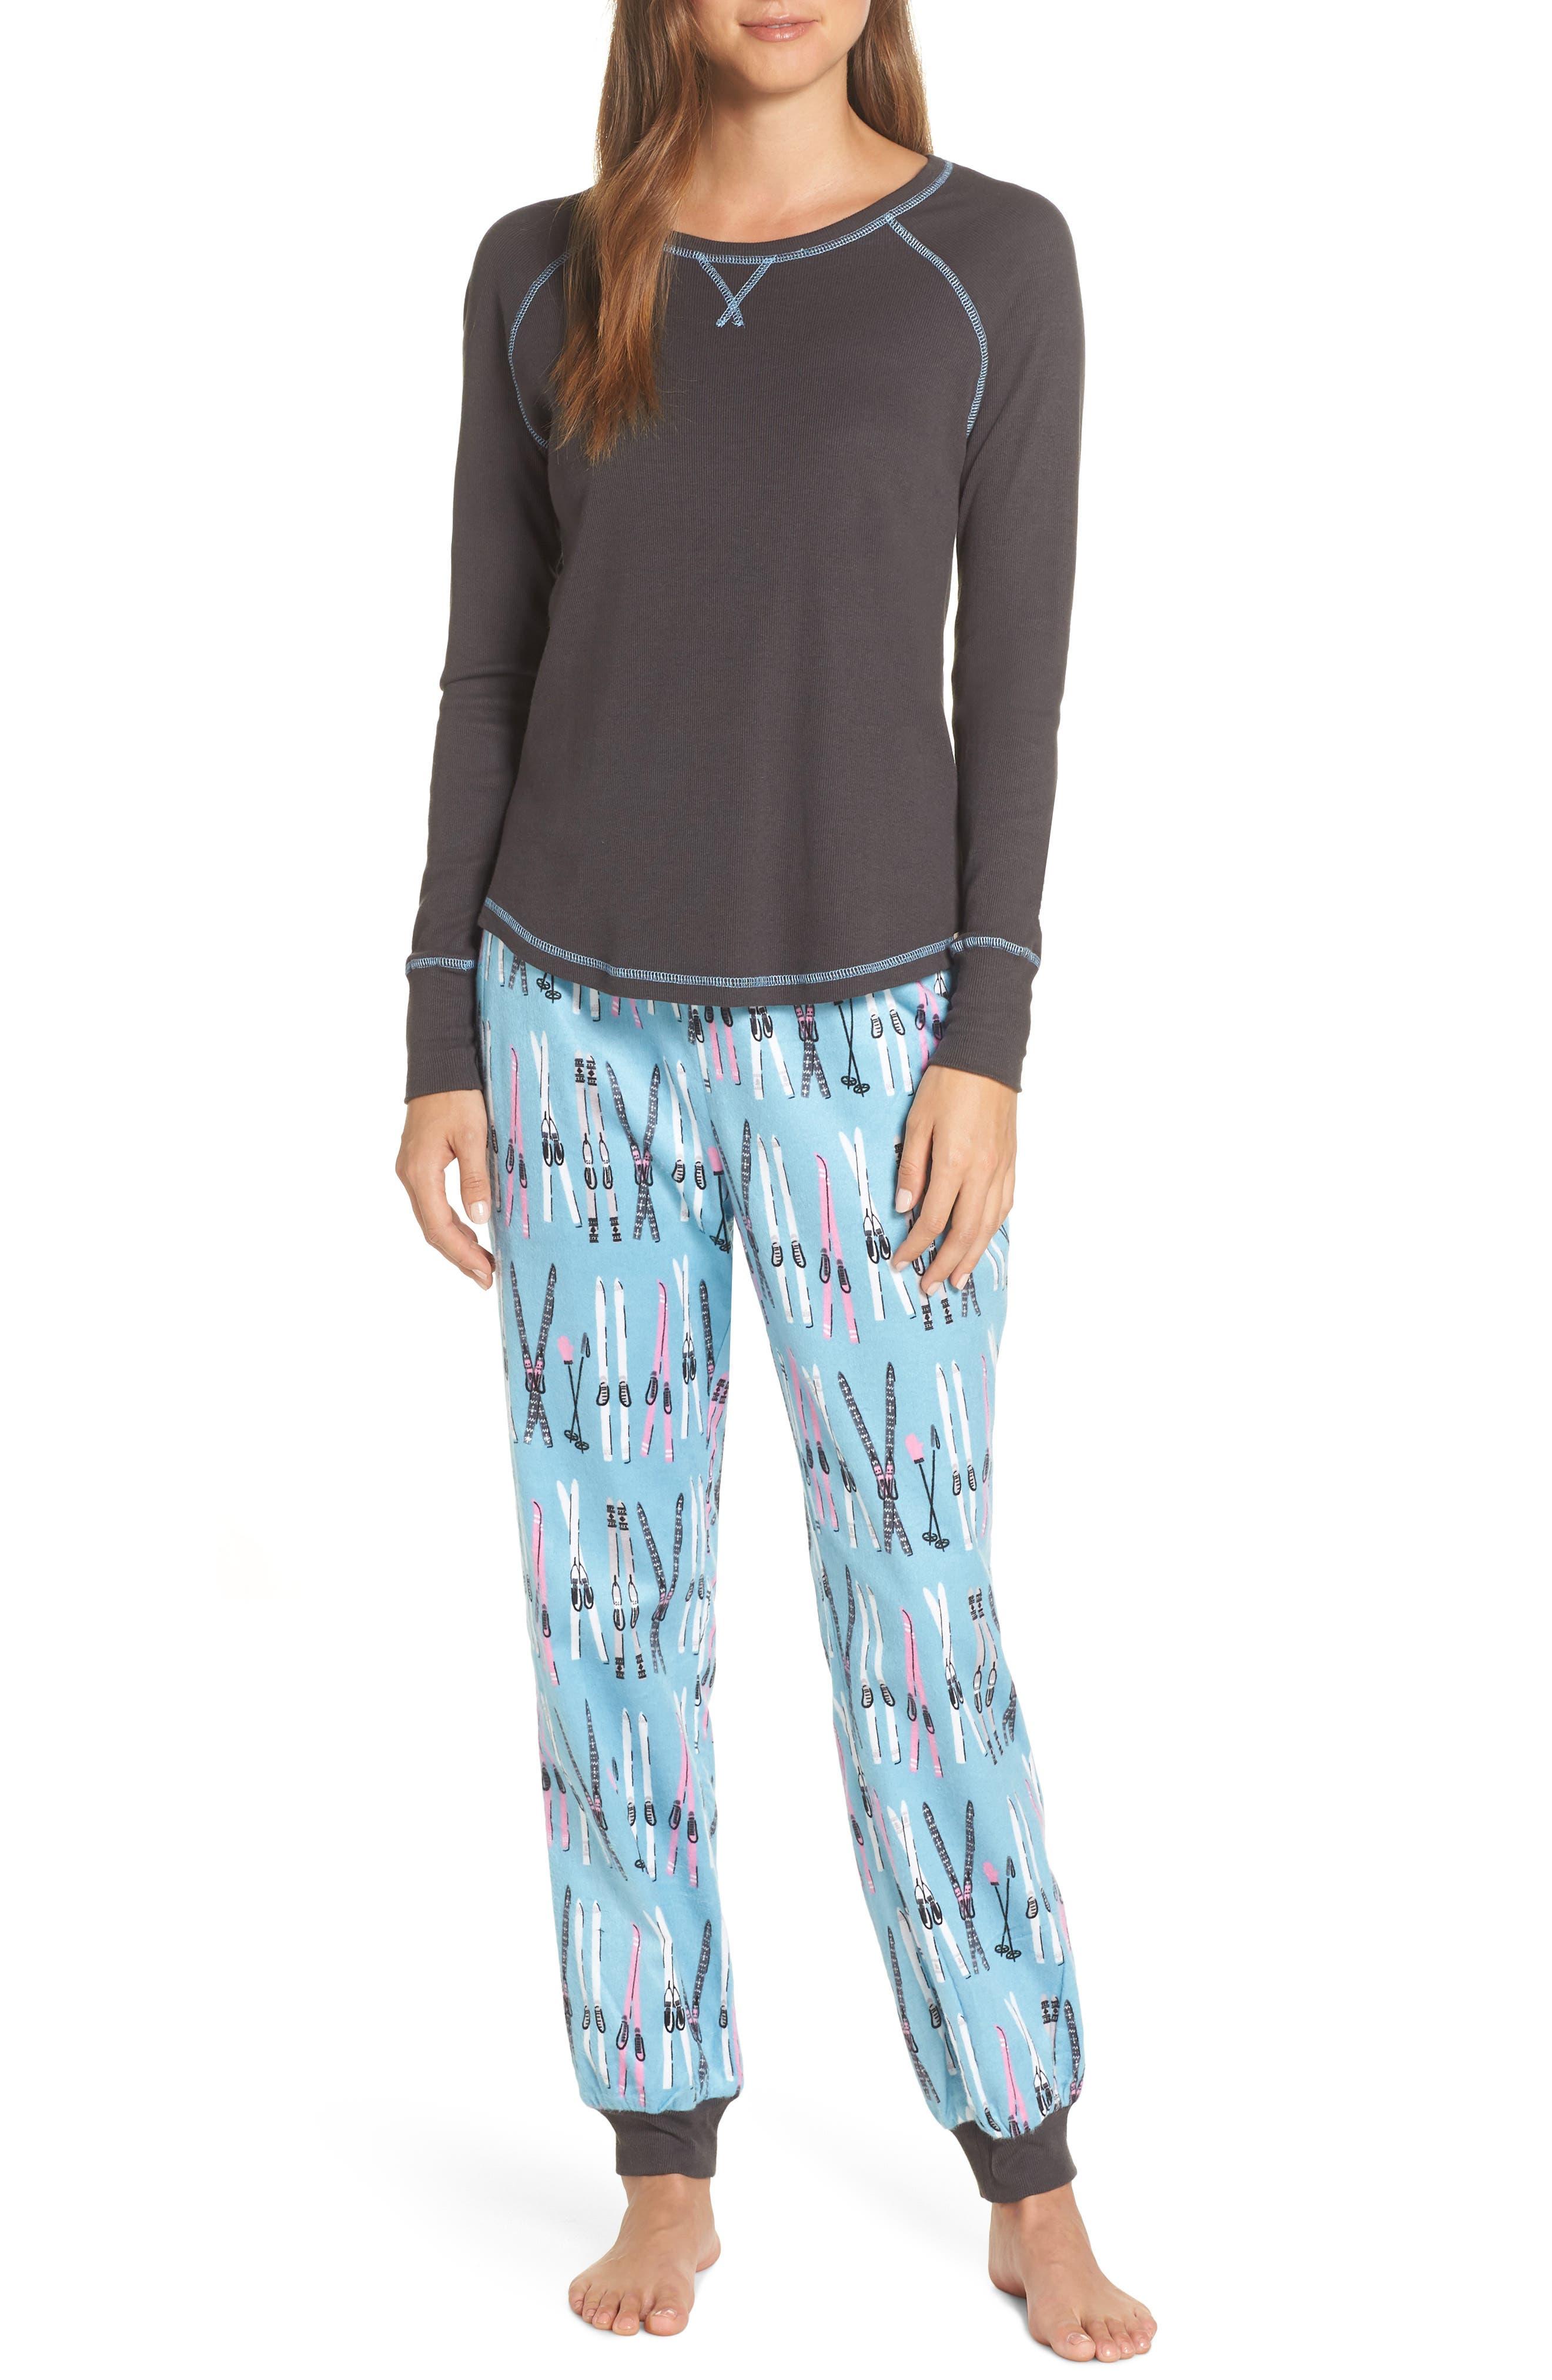 Munki Munki Knit & Flannel Pajamas, Blue/green